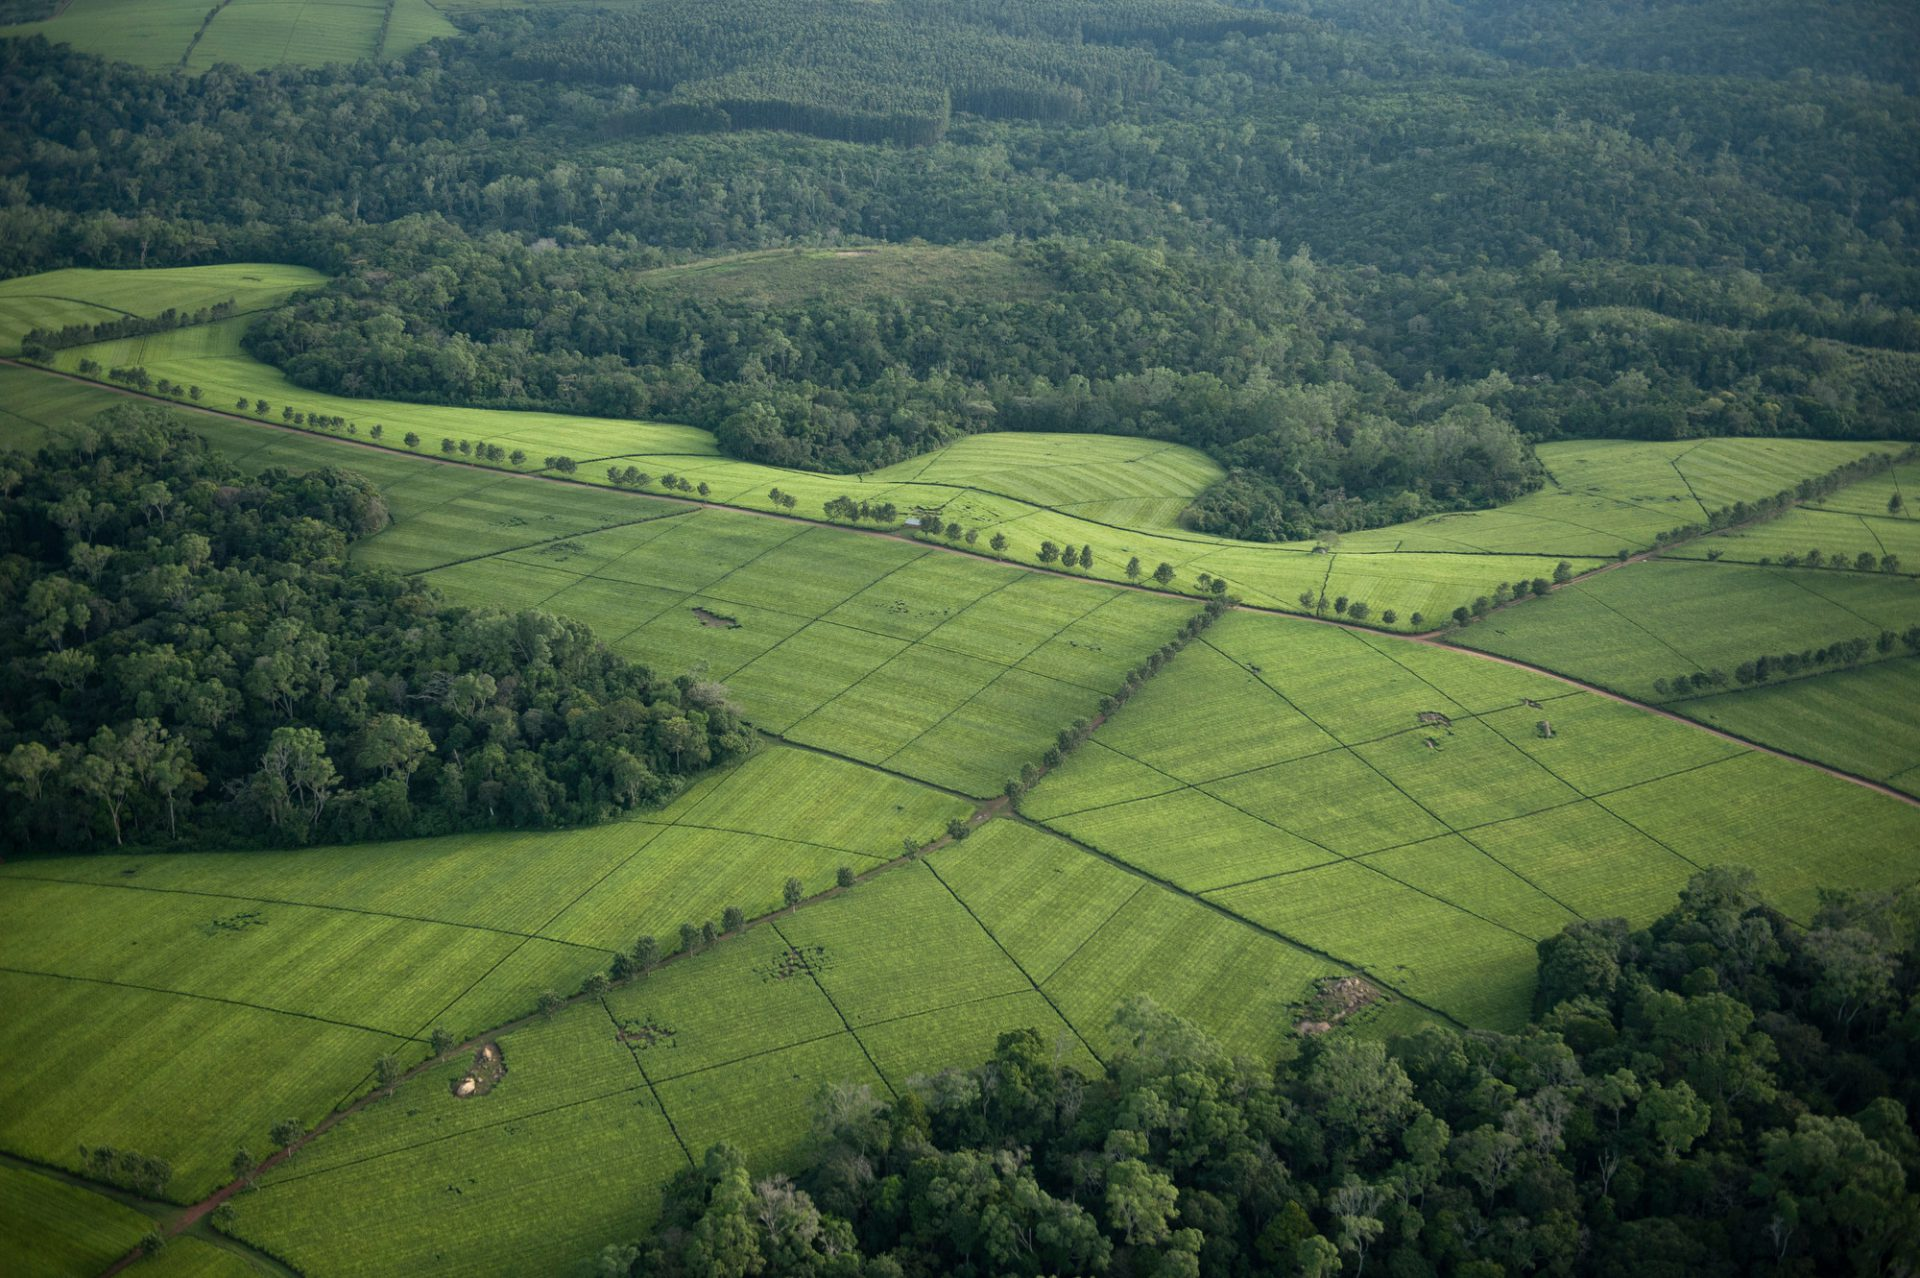 Photo: The Mwenge tea estate in the Albertine Rift.